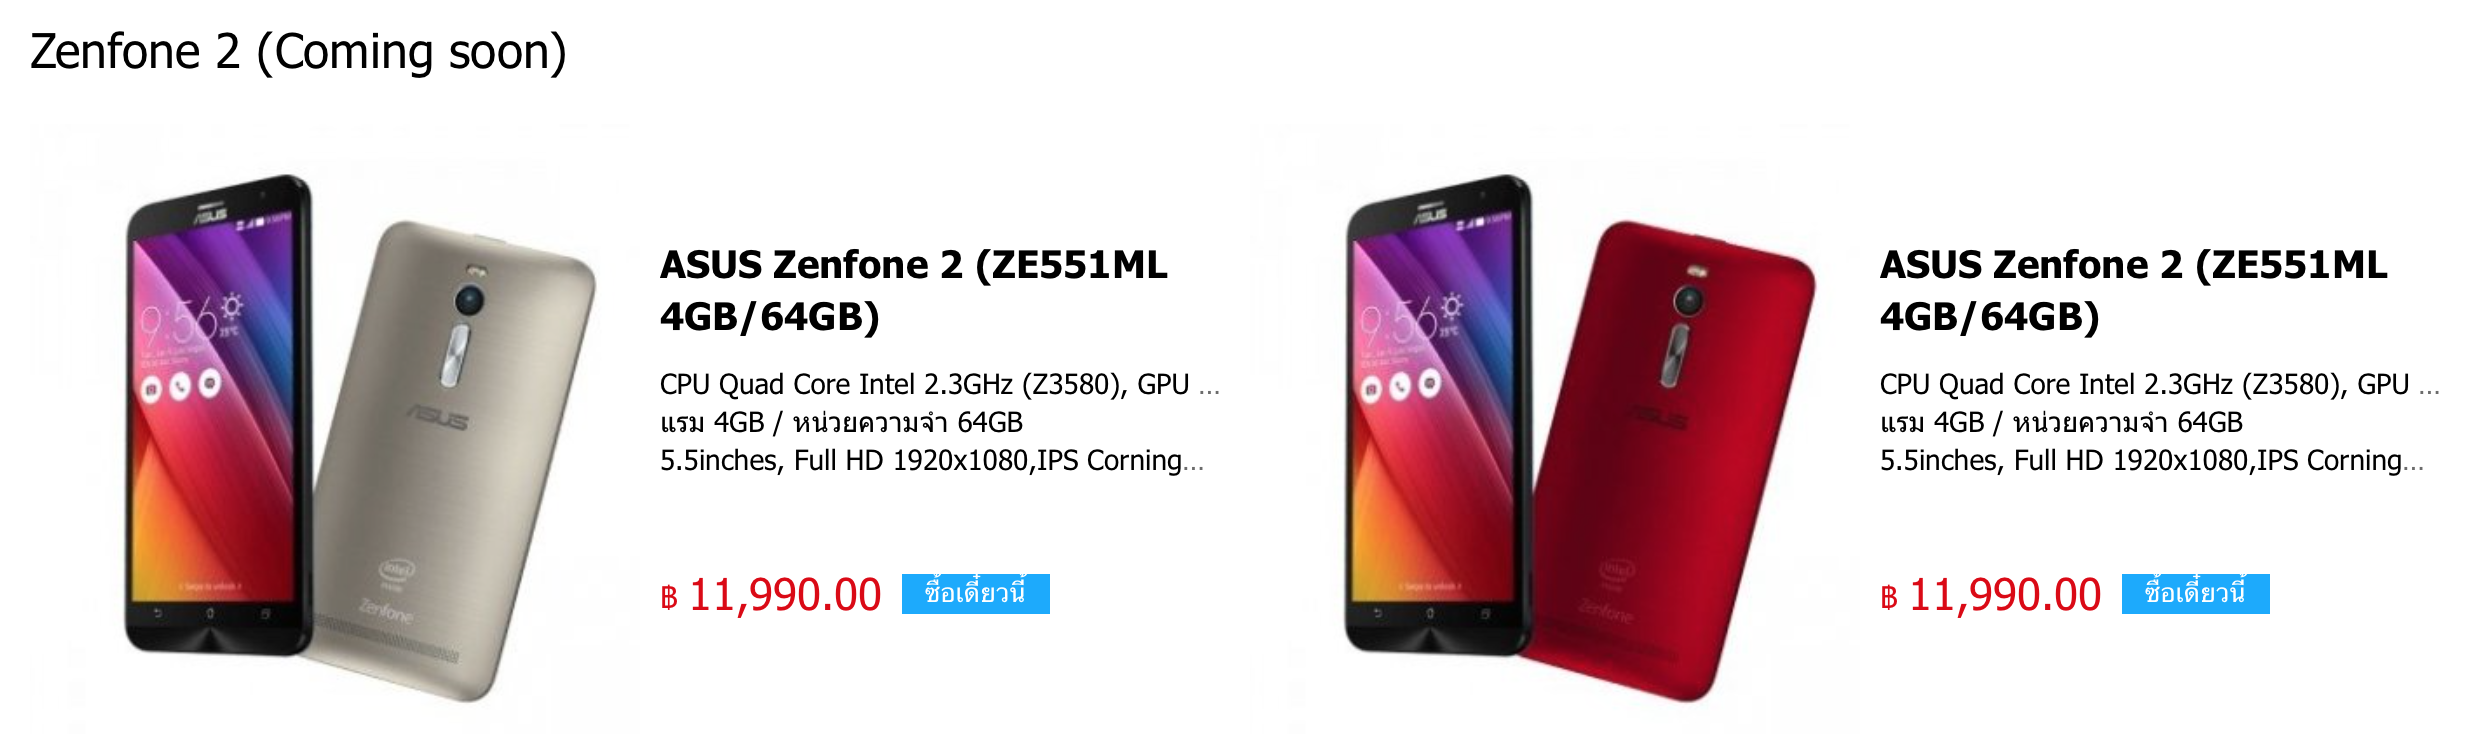 Asus-Store-Thailand-Zenfone-2-002